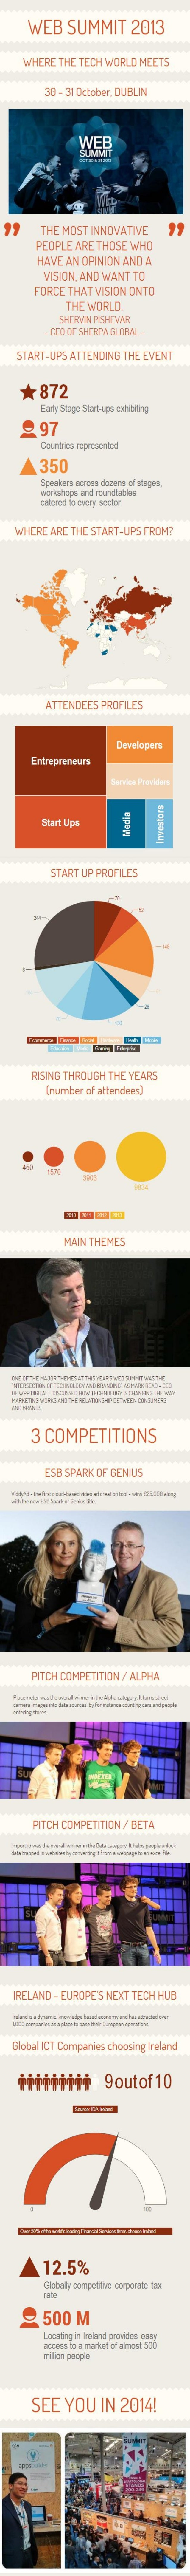 Dublin Web Summit 2013